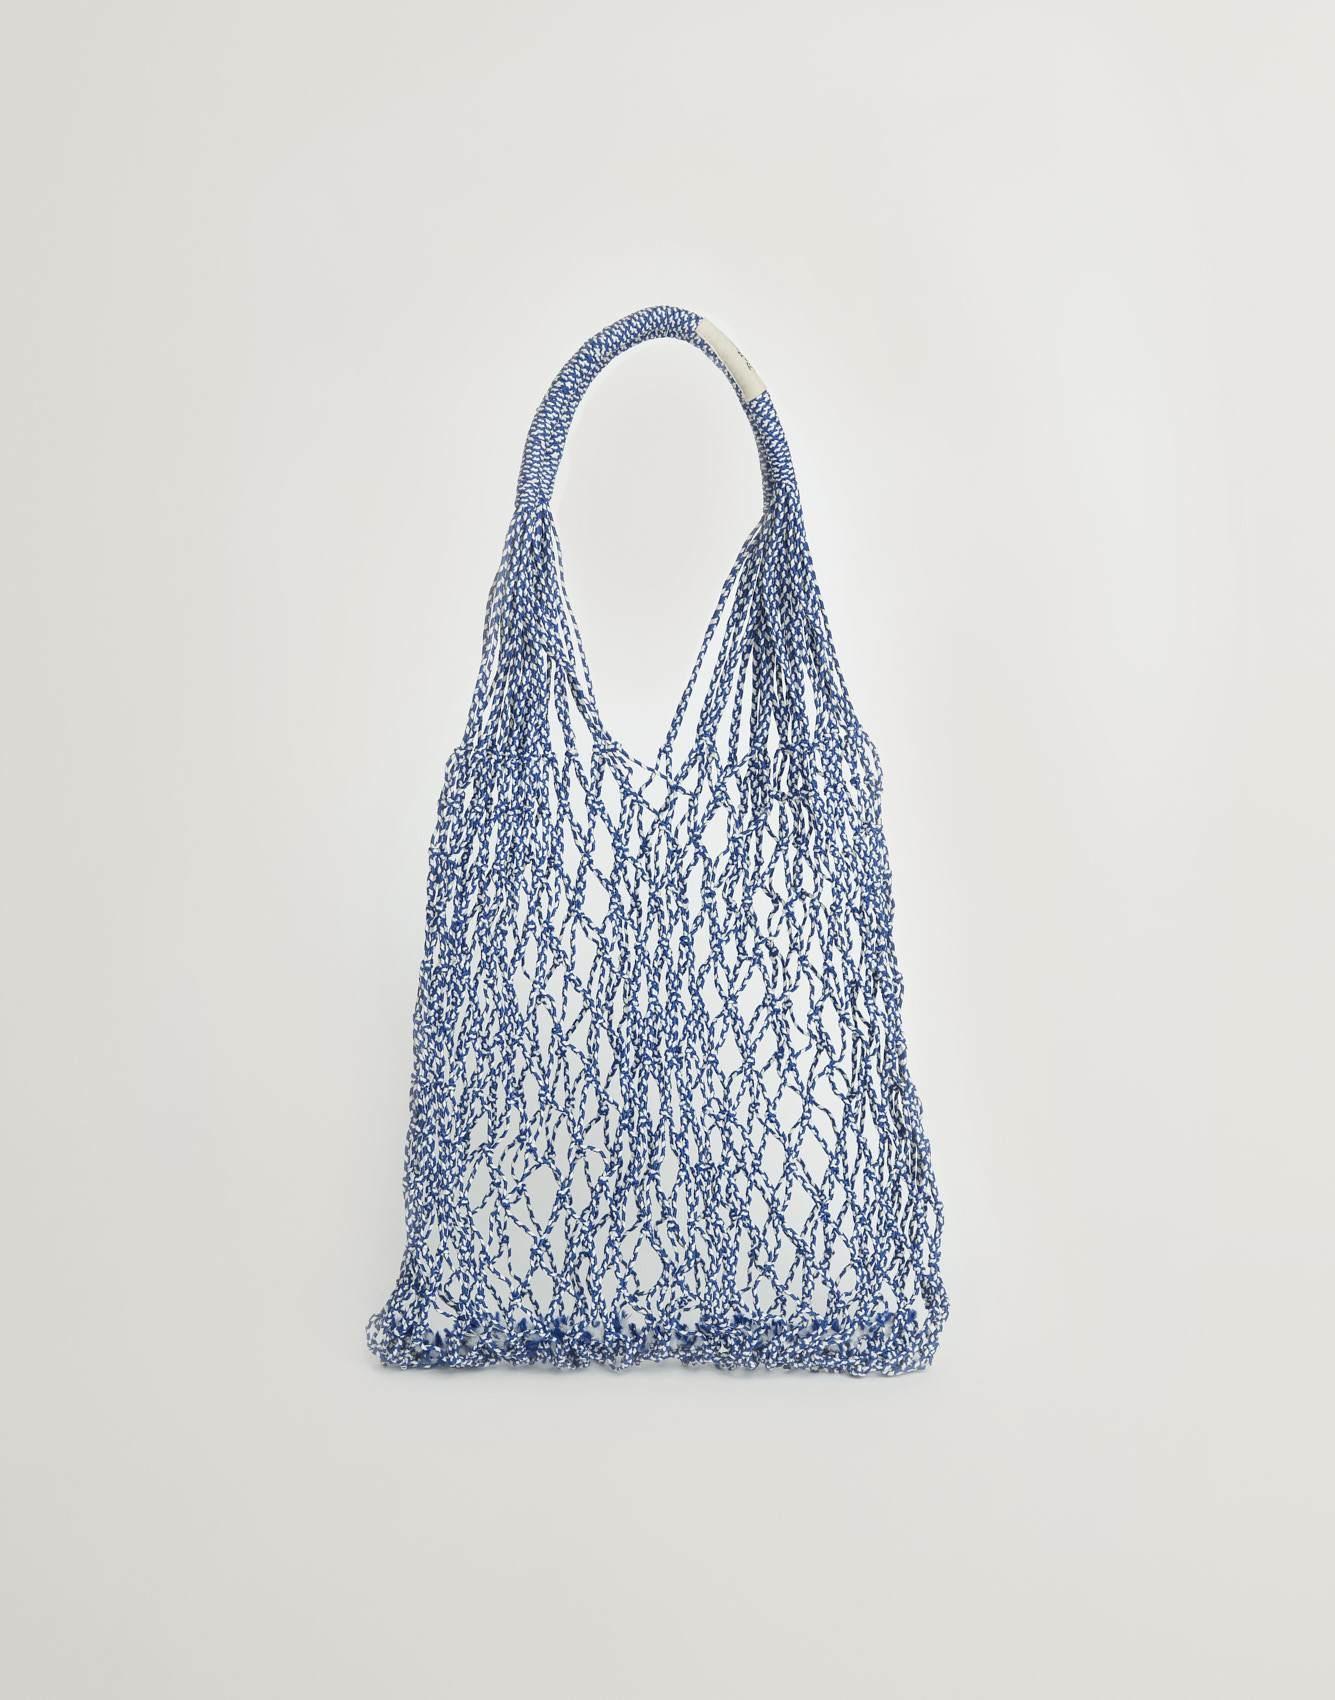 Bellerose Bellerose Crochet Mesh Tote Bag